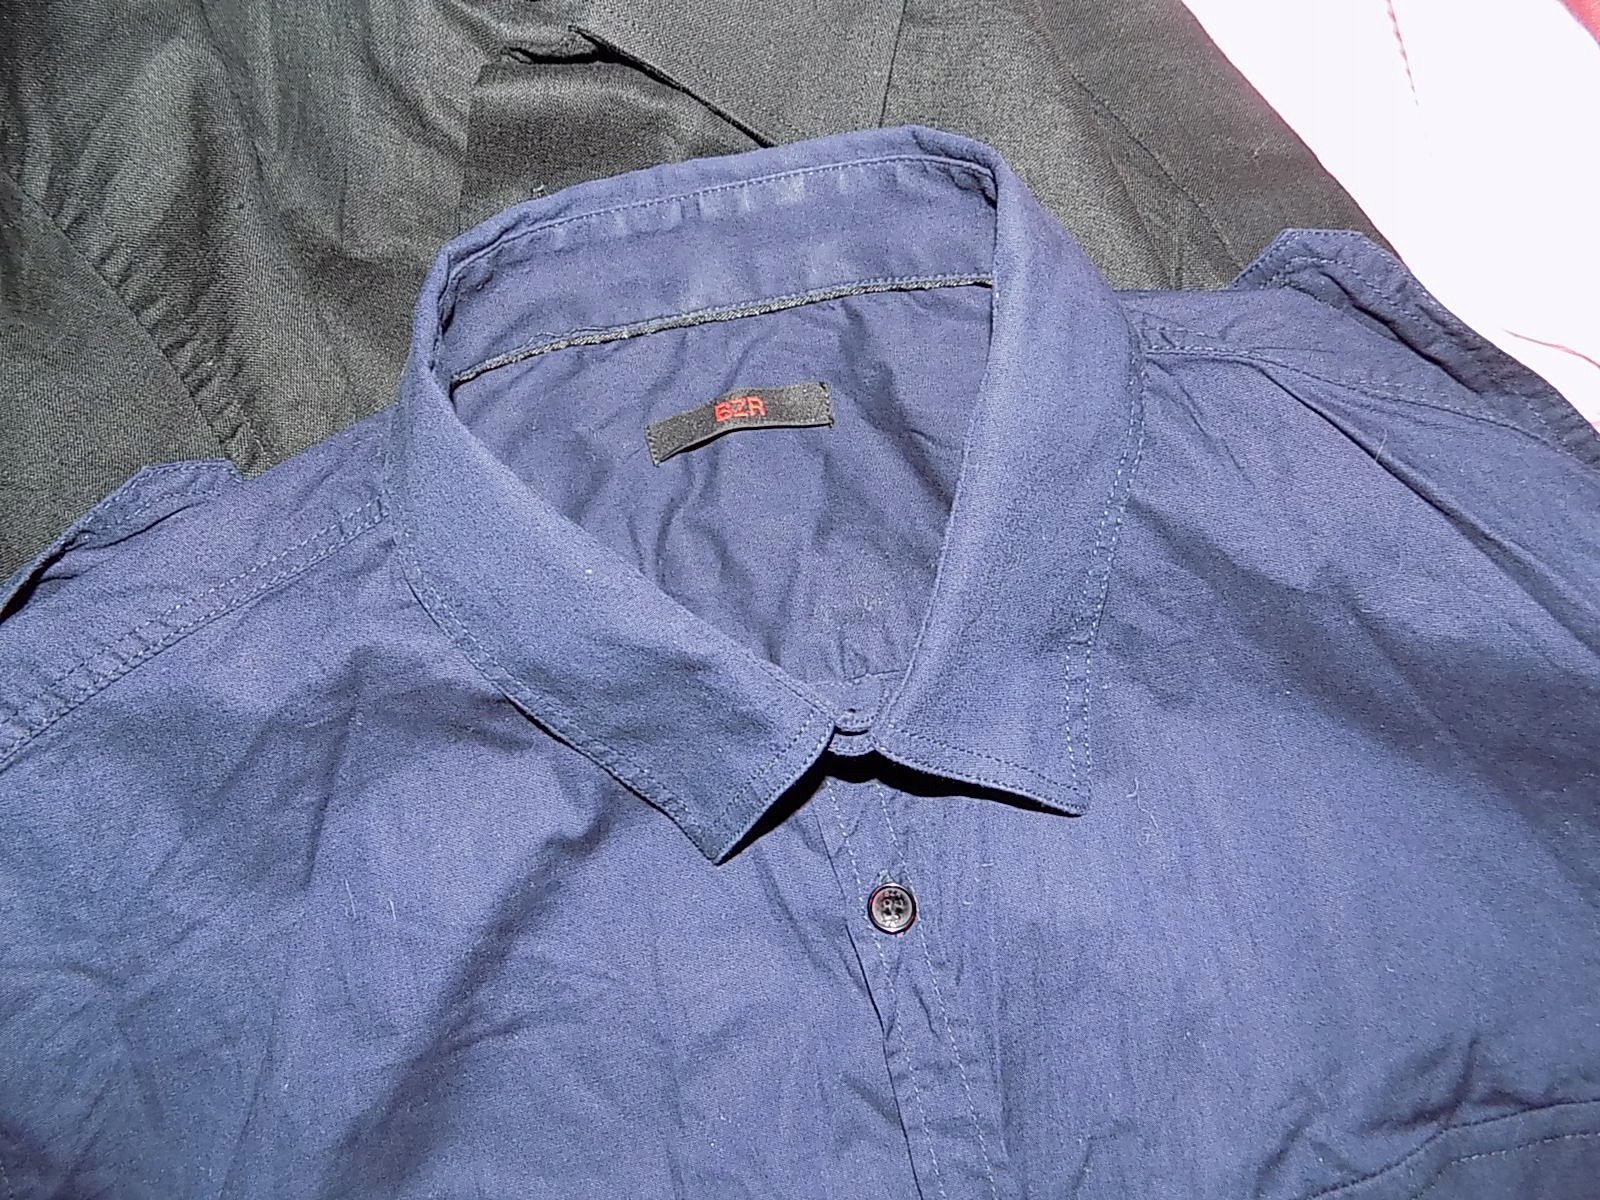 BZR Bruuns Bazaar koszula męska L 41 pagony 7425046202  fKr7i